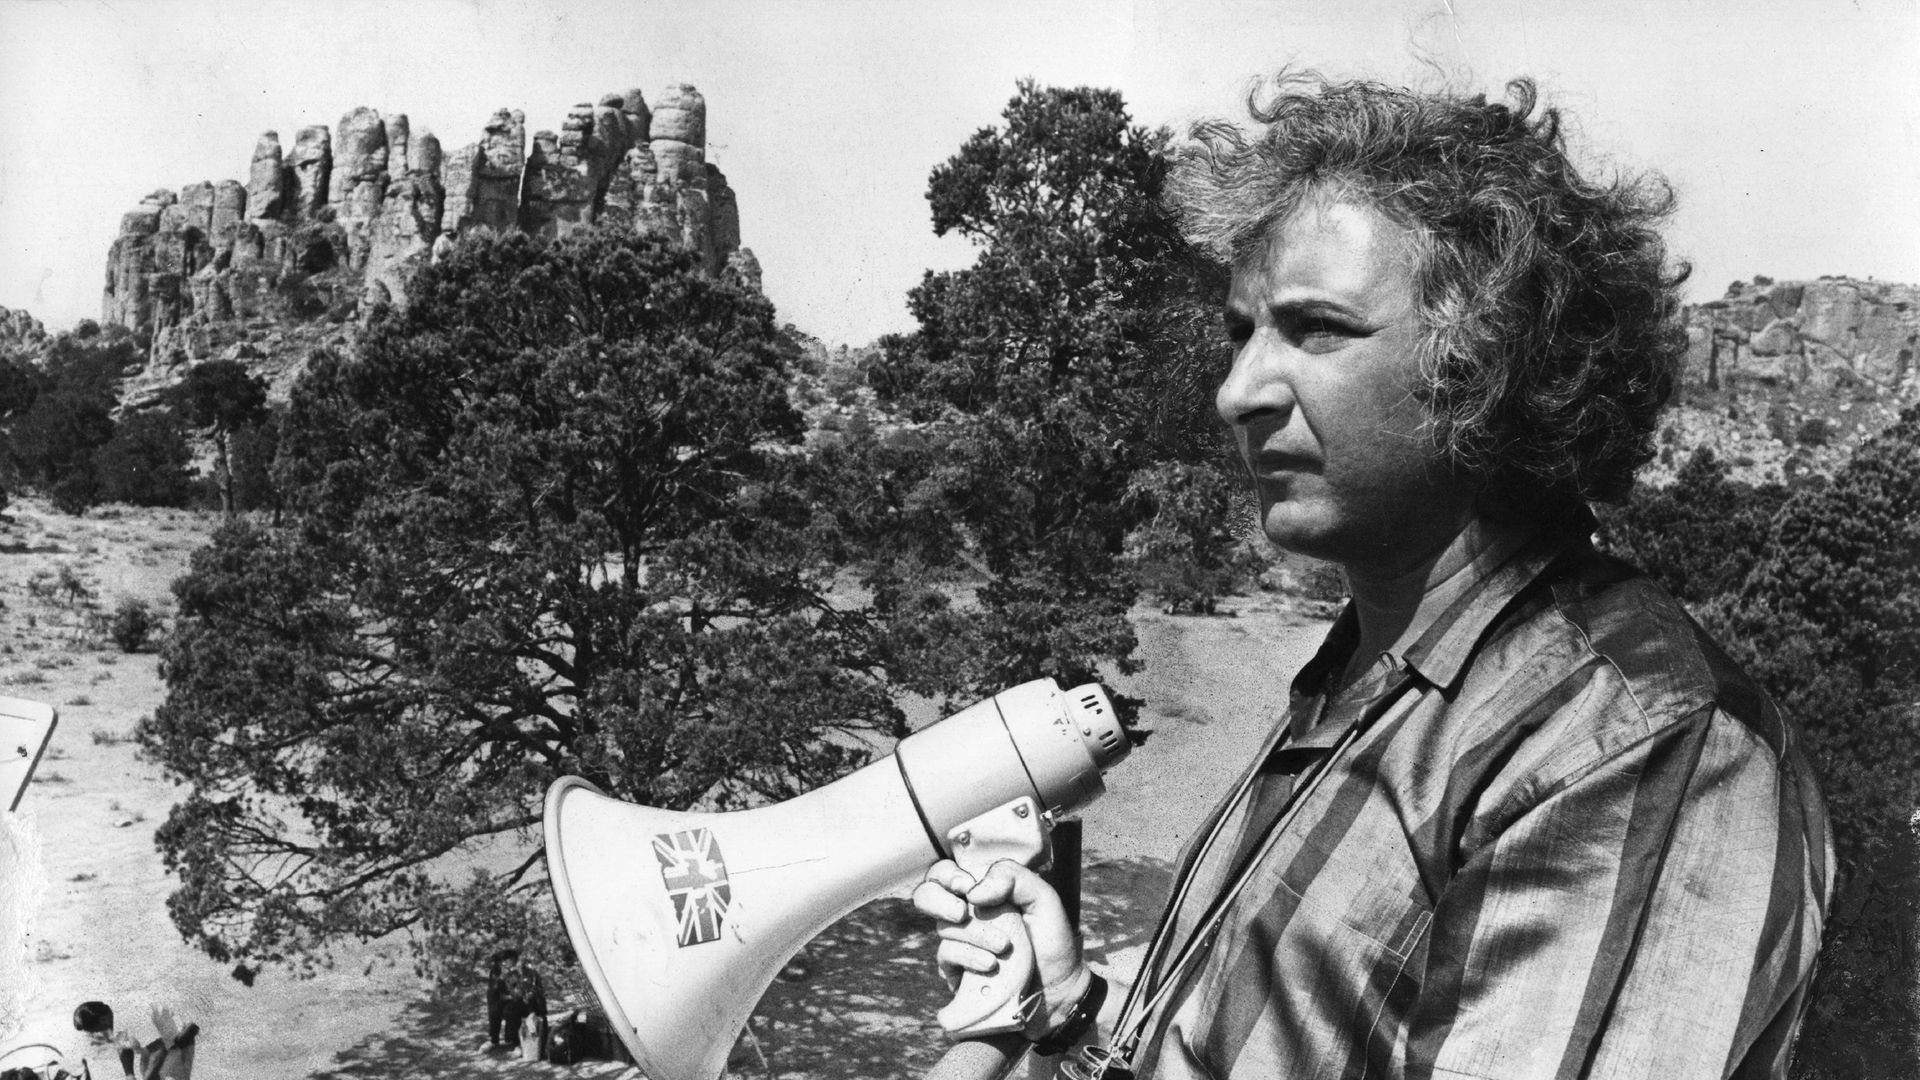 Michael Winner, on location in Cambridge, directing The Nightcomers. The 1971 film starred Marlon Brando - Credit: Getty Images